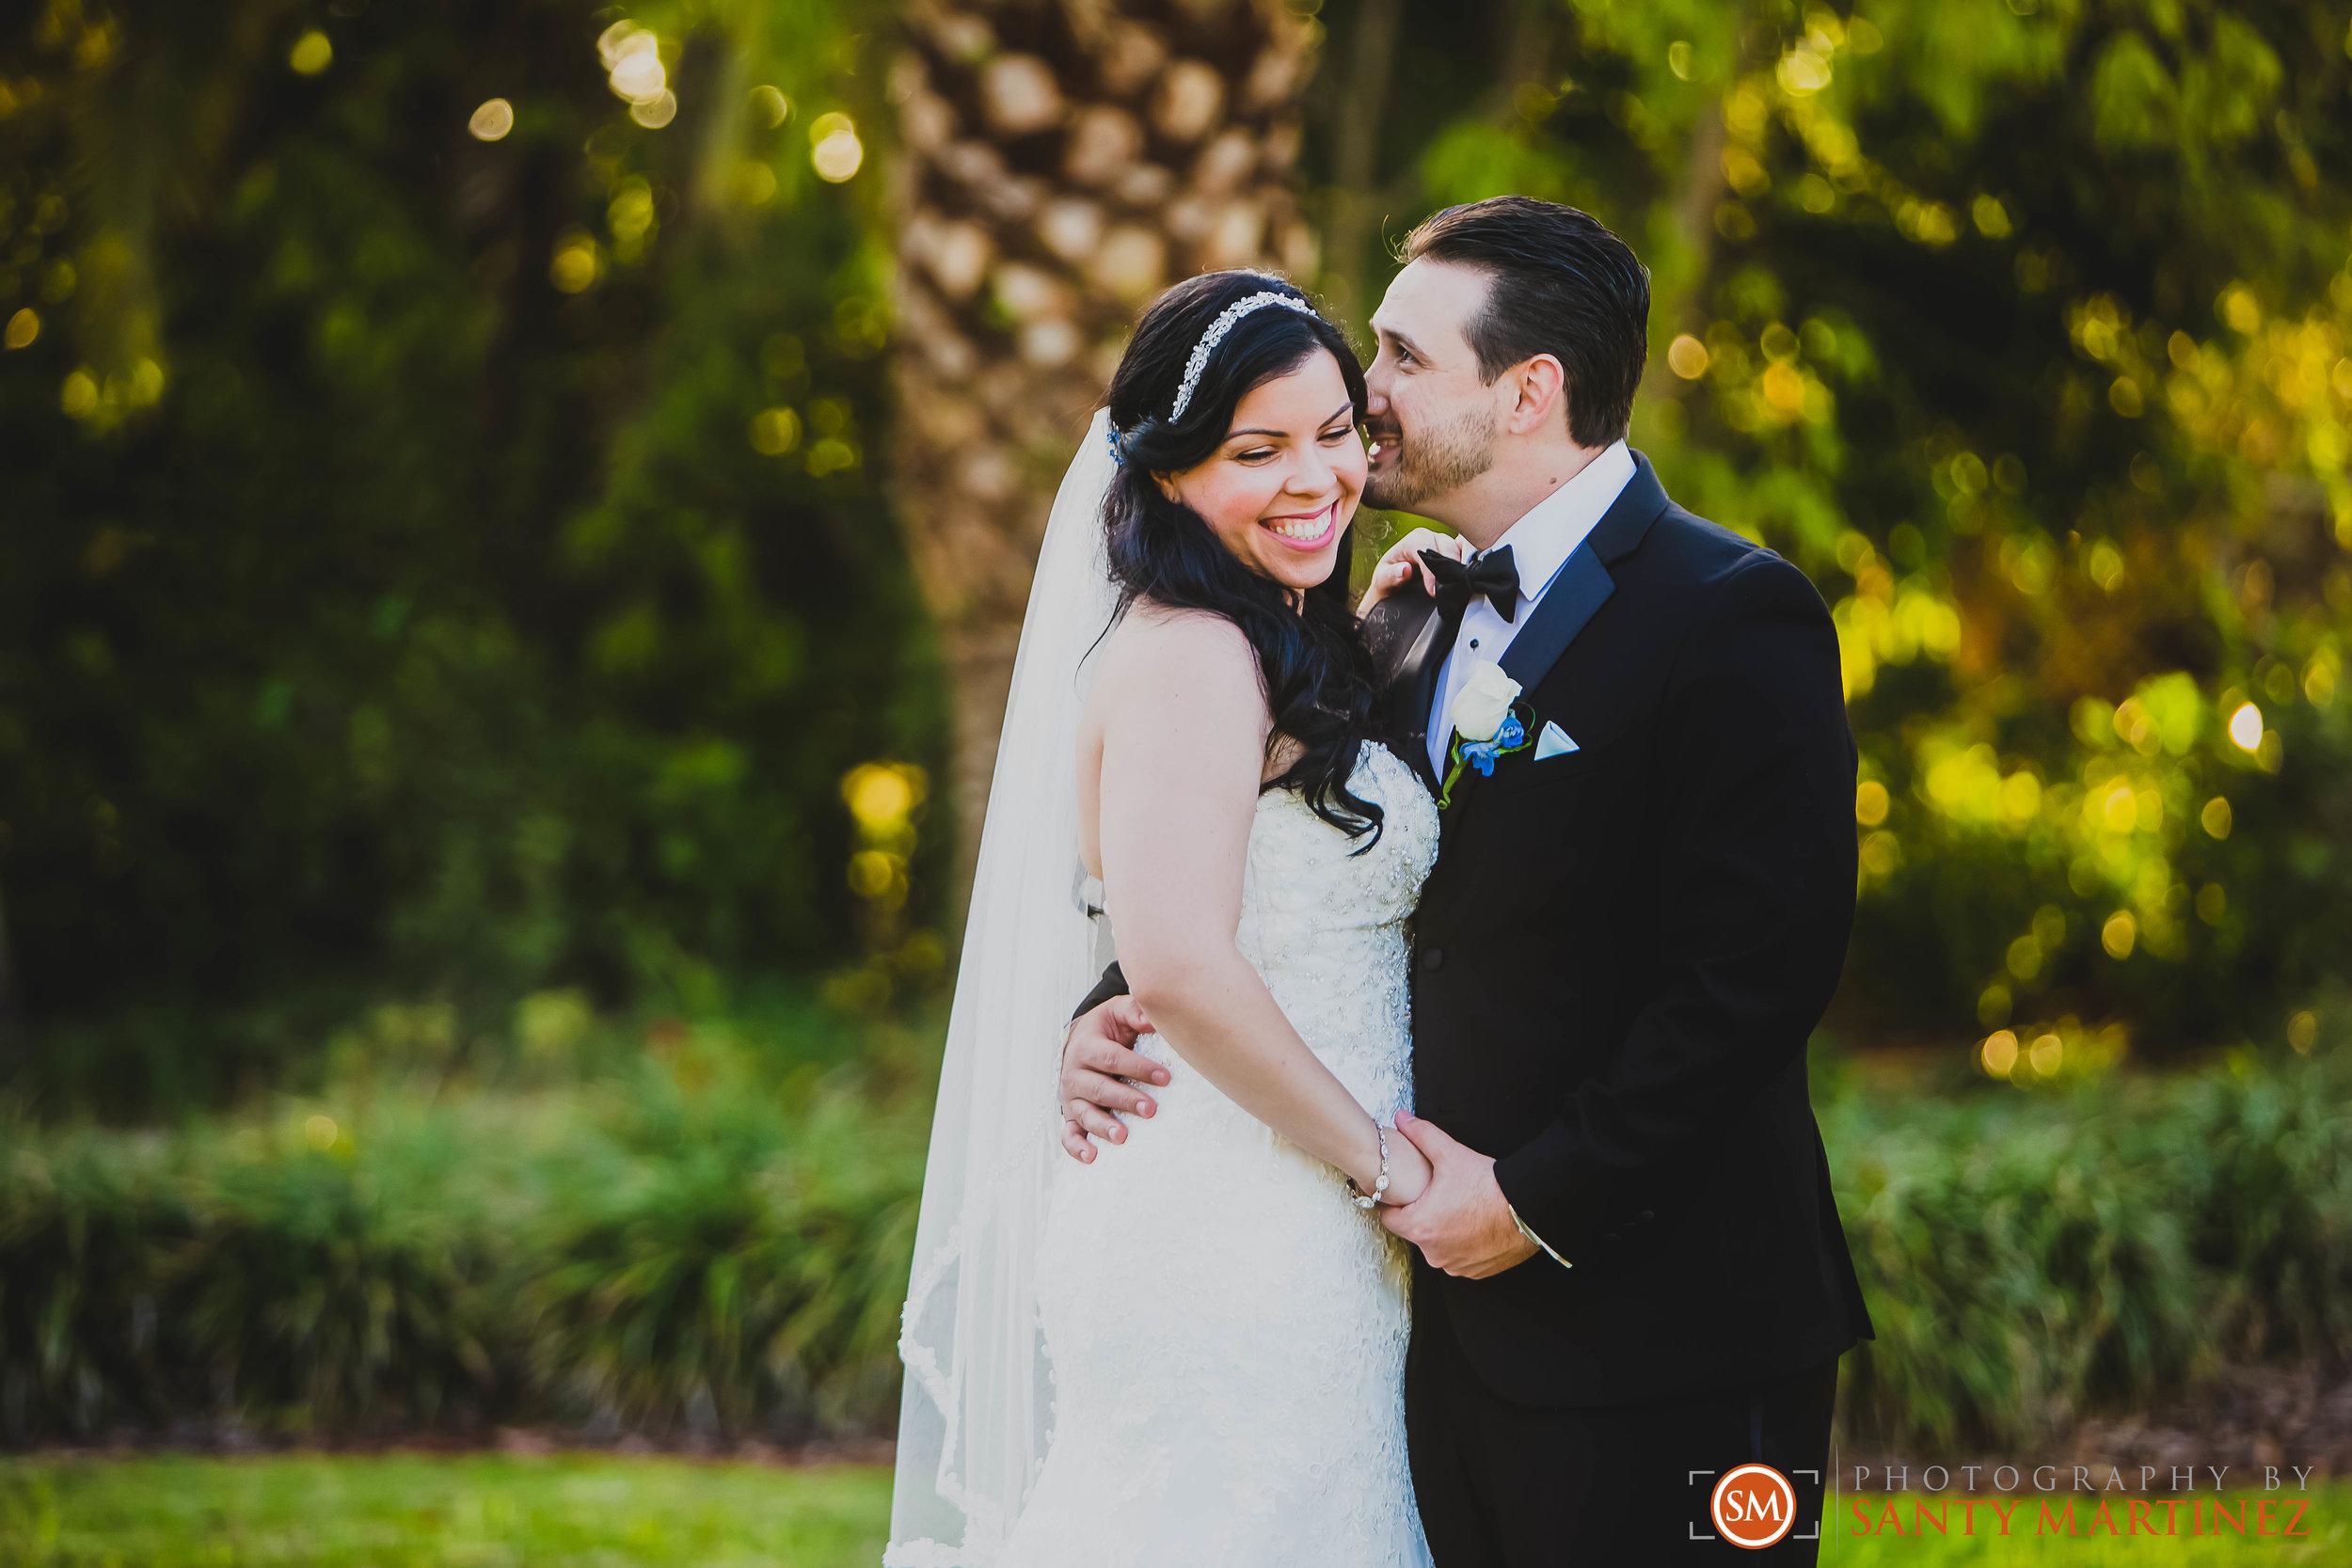 Wedding - Whimsical key West House - Photography by Santy Martinez-28.jpg